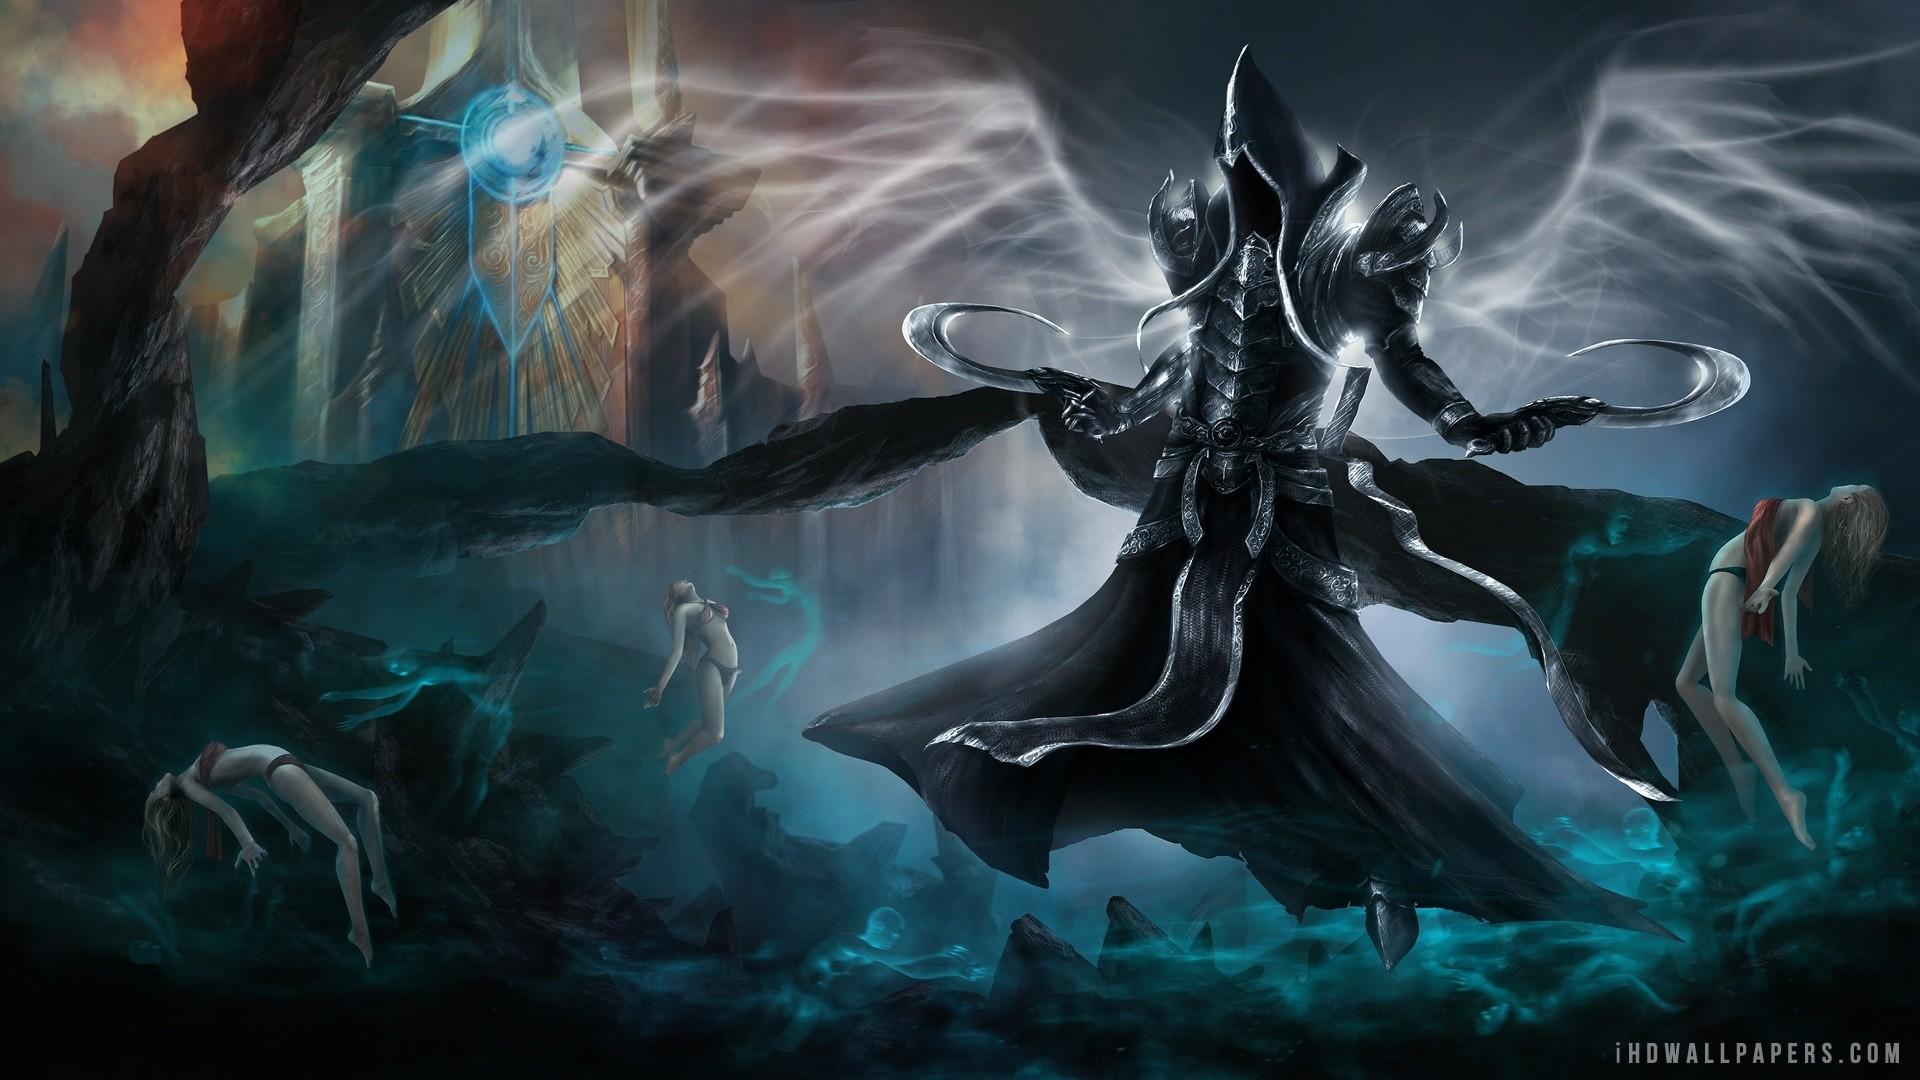 Diablo 3 Reaper Of Souls Wallpapers: El Diablo Wallpapers (64+ Images